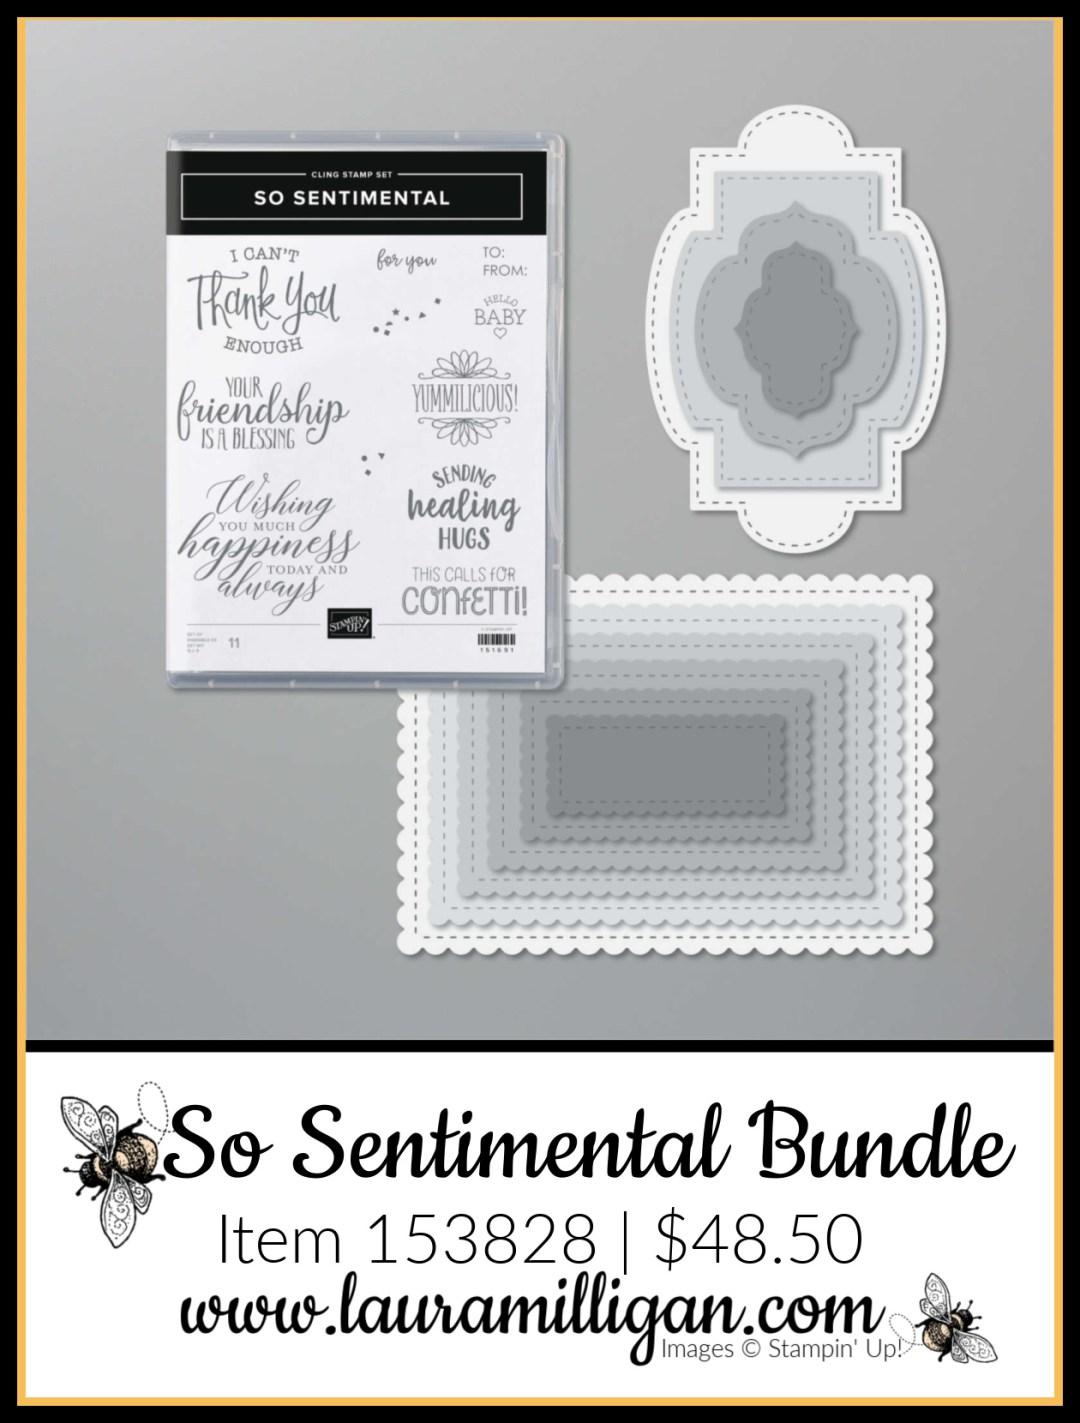 So Sentimental Bundle from Stampin' Up! Item 153828